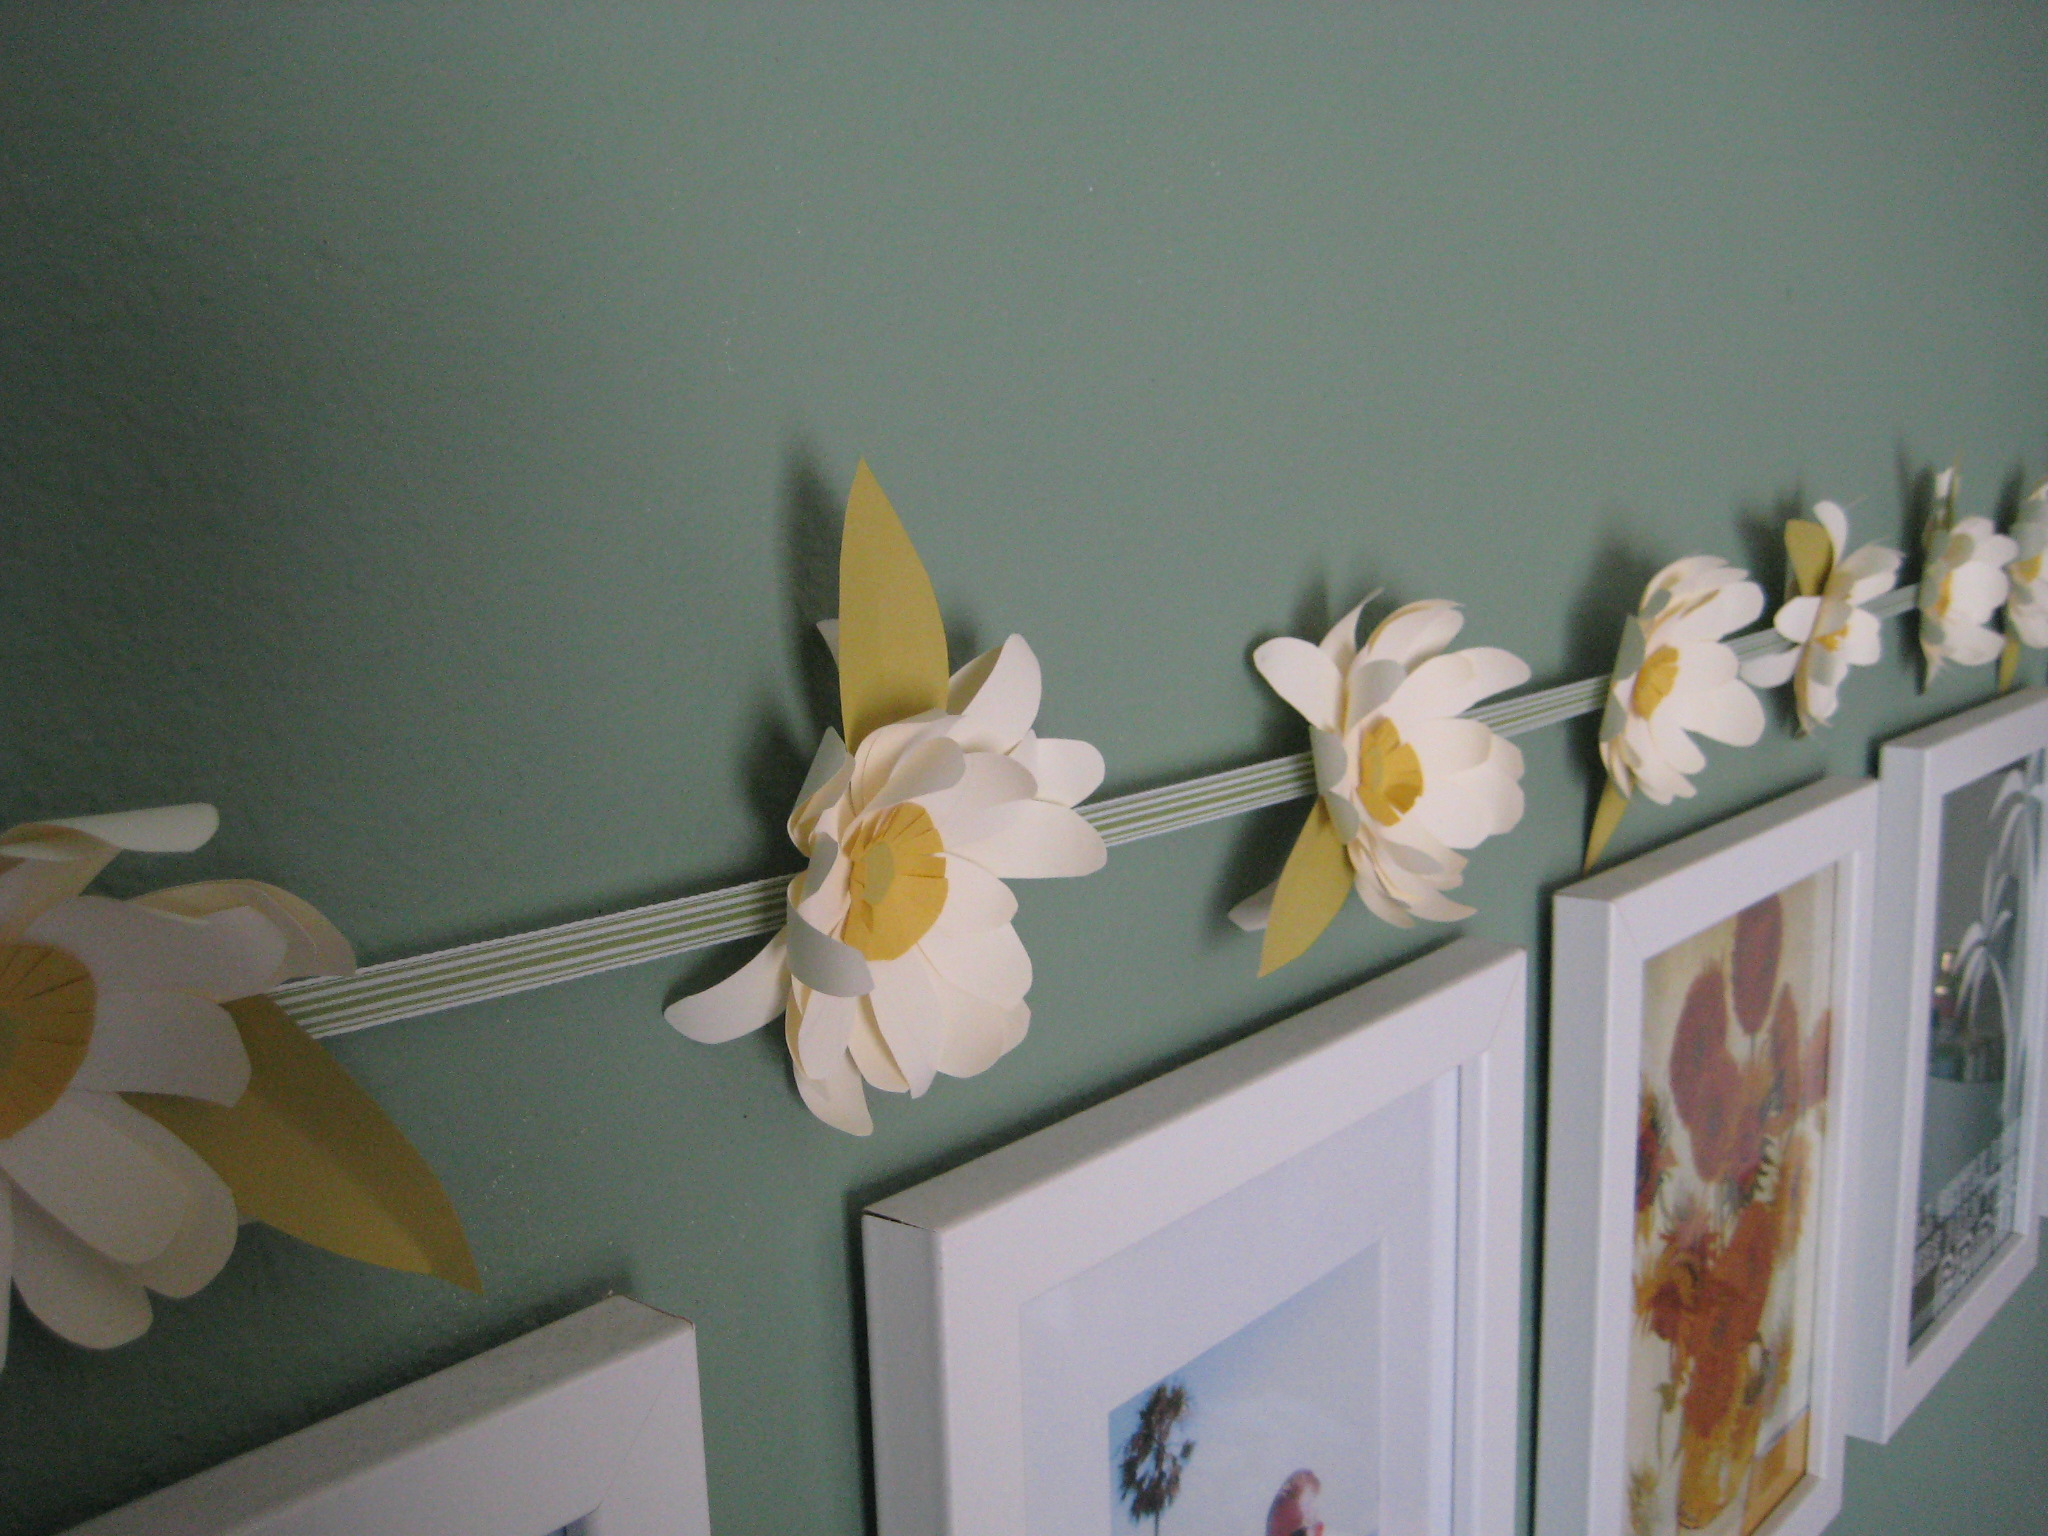 Enjoy it by elise blaha cripe how to tuesday simple paper flowers how to tuesday simple paper flowers img4983 izmirmasajfo